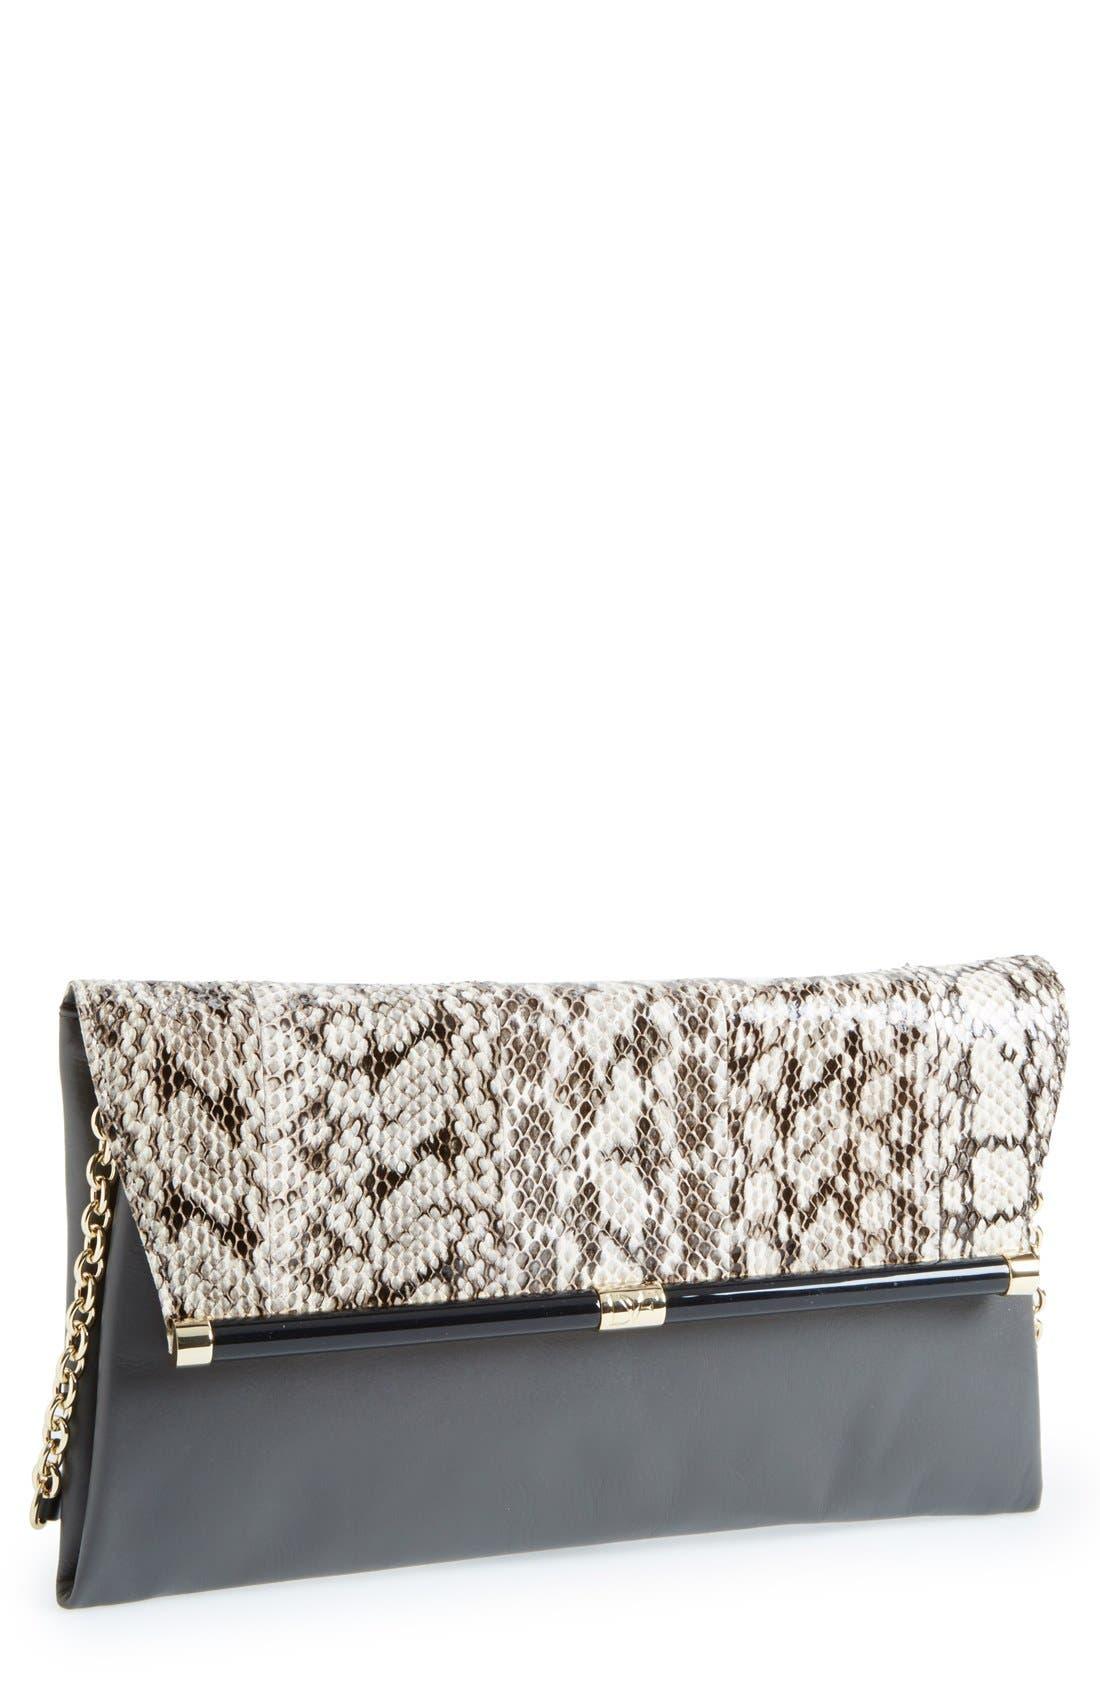 Main Image - Diane von Furstenberg 'Large 440' Snakeskin Envelope Clutch